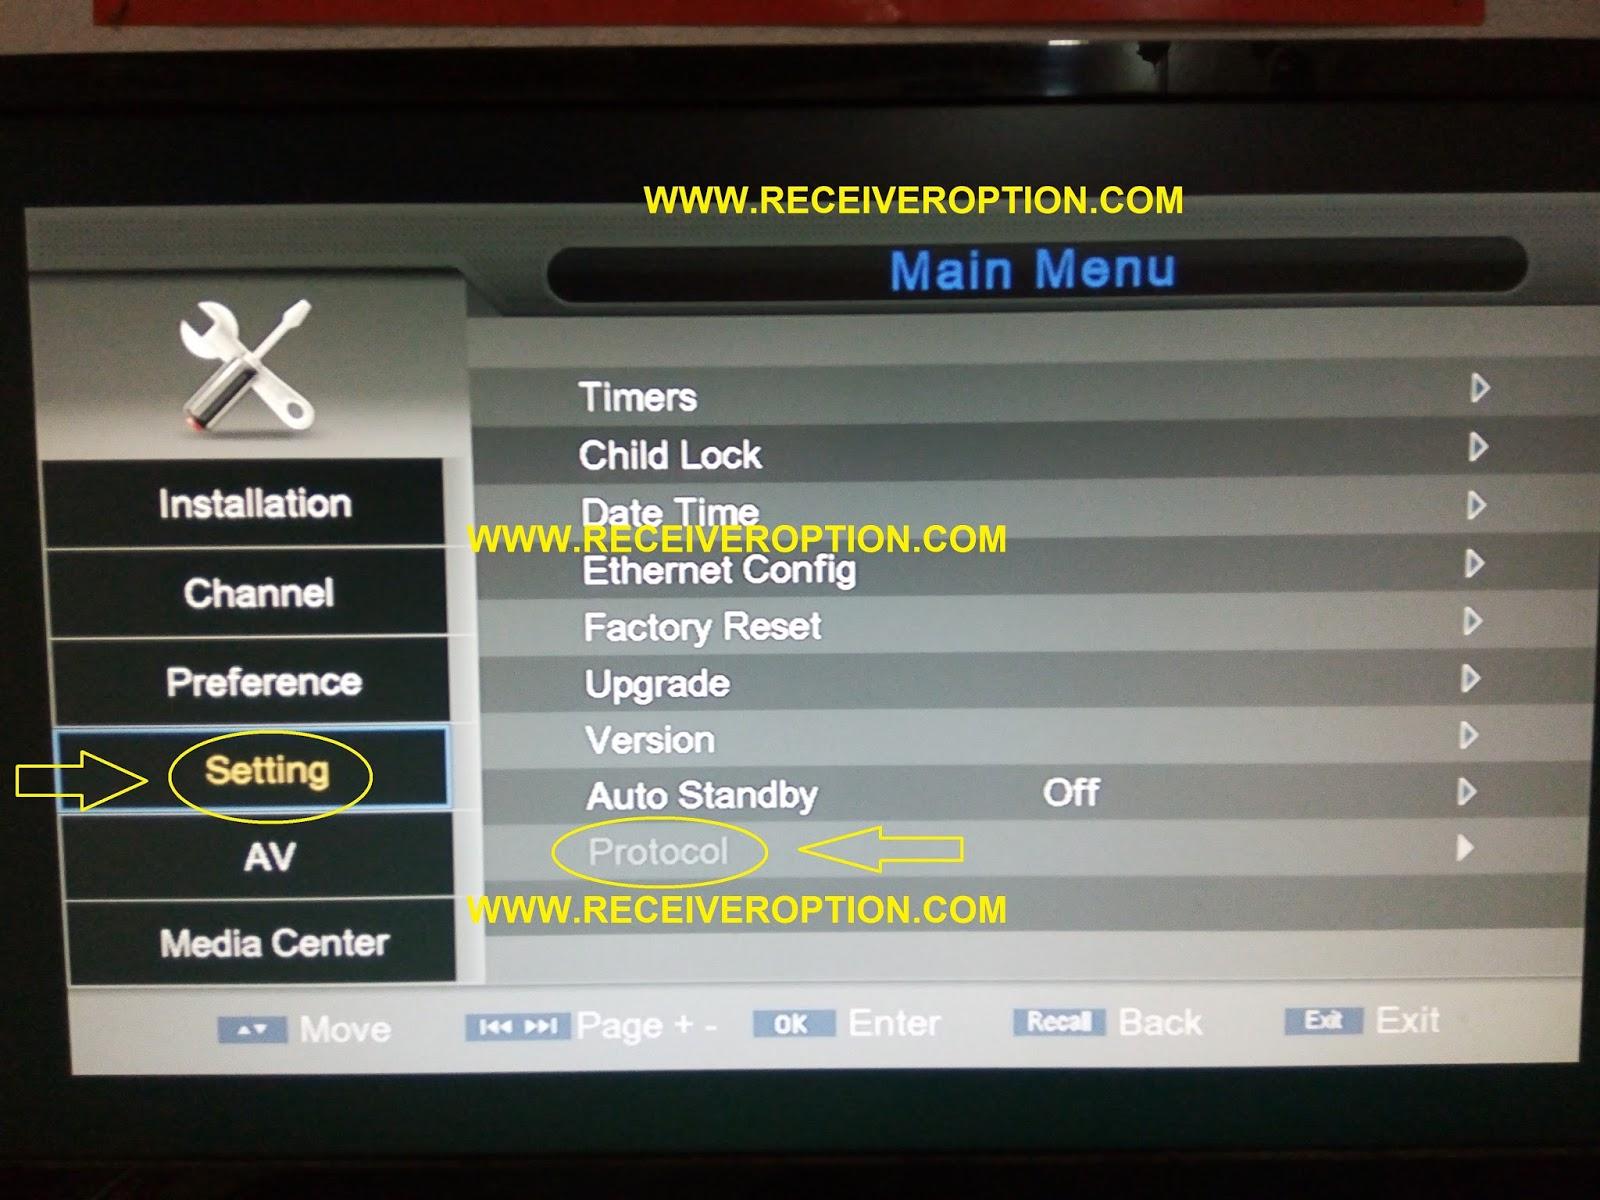 NEOSAT 550D HD RECEIVER CCCAM OPTION - HOW TO ENTER BISS KEY